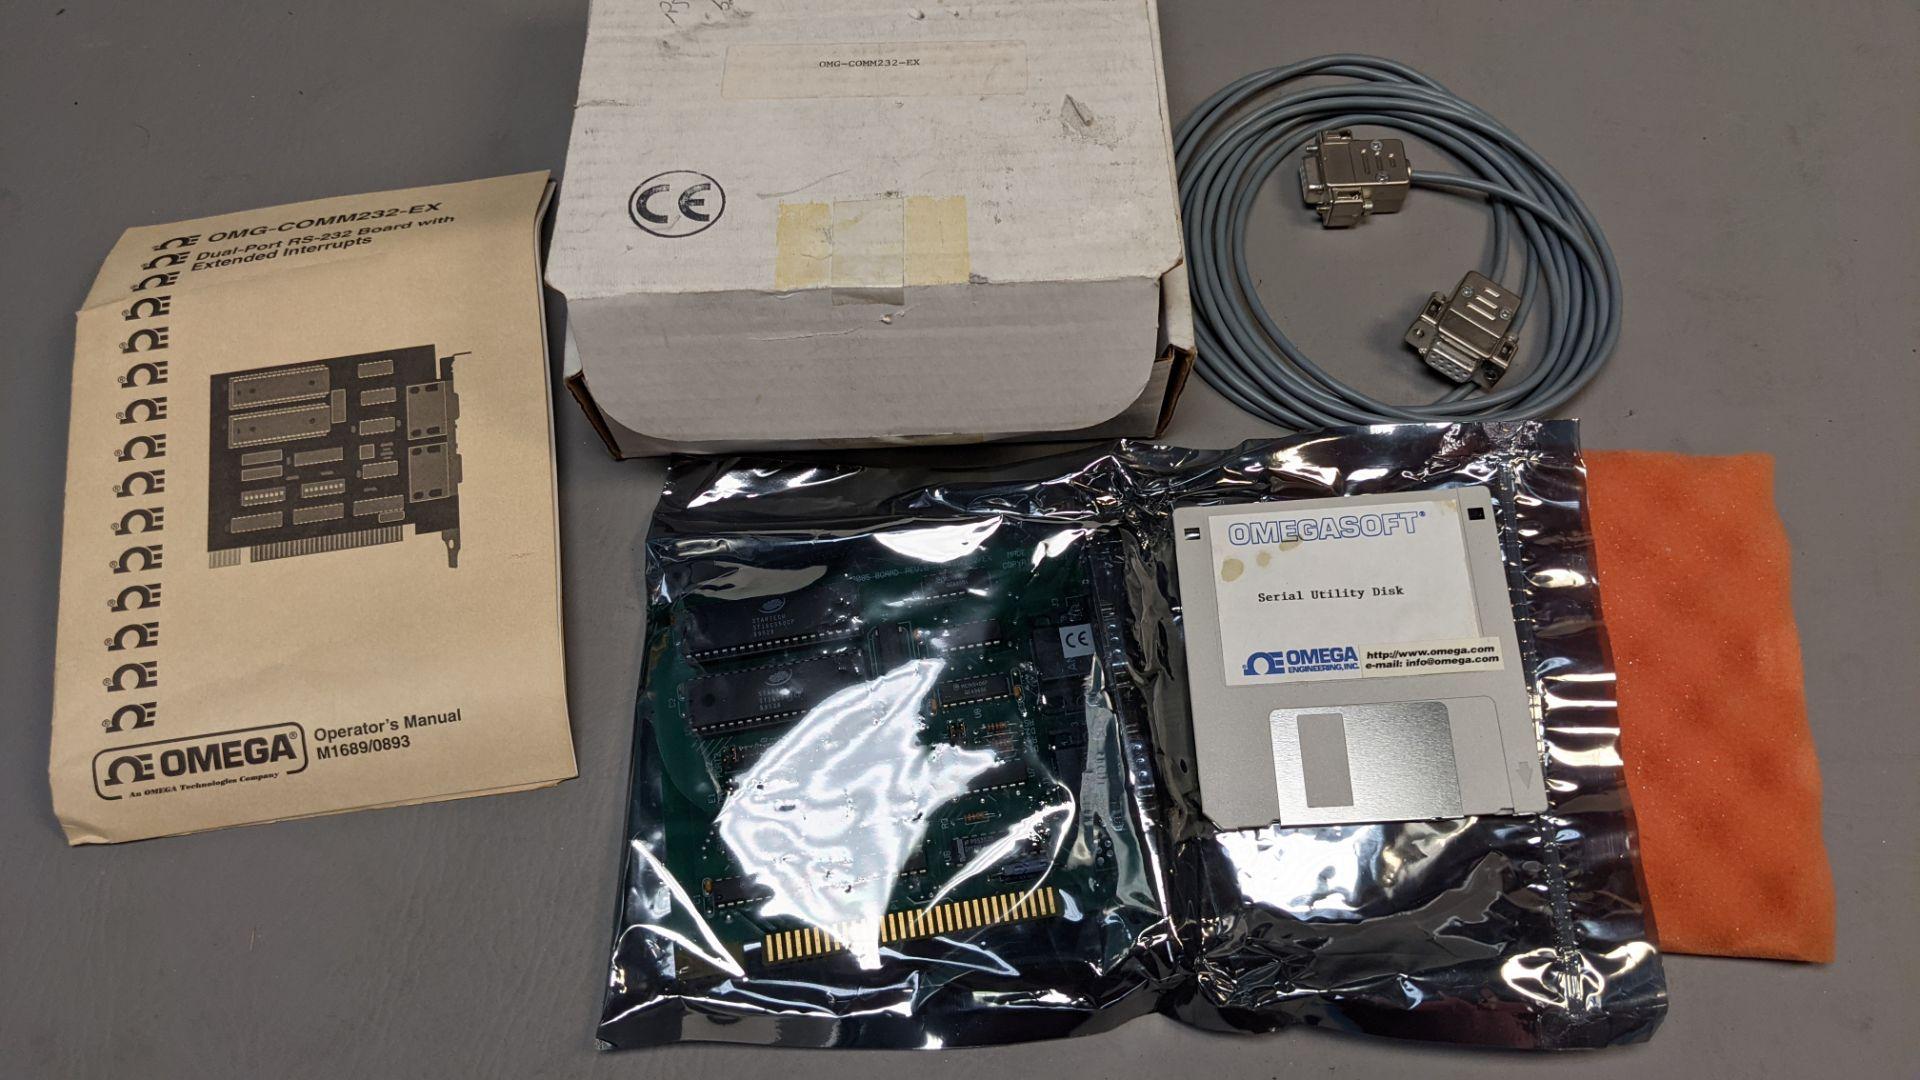 OMEGA DUAL PORT RS-232 INTERFACE CARD